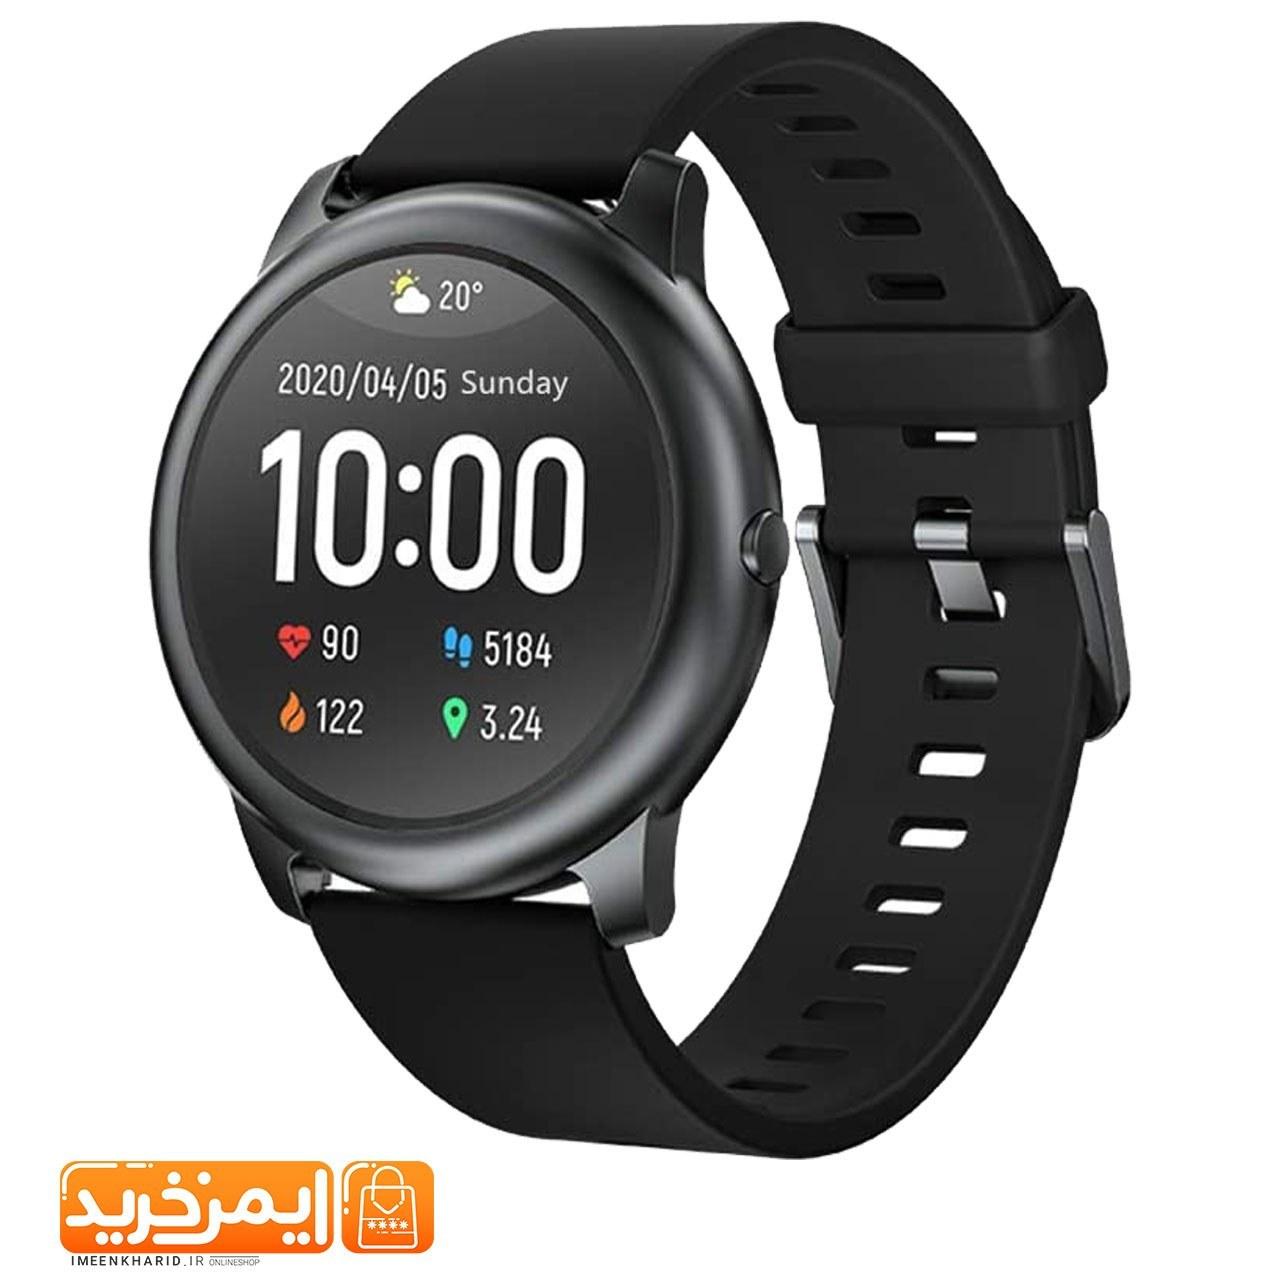 عکس ساعت هوشمند هایلو solar شیائومی SL05 haylou smart watch solar SL05 ساعت-هوشمند-هایلو-solar-شیایومی-sl05